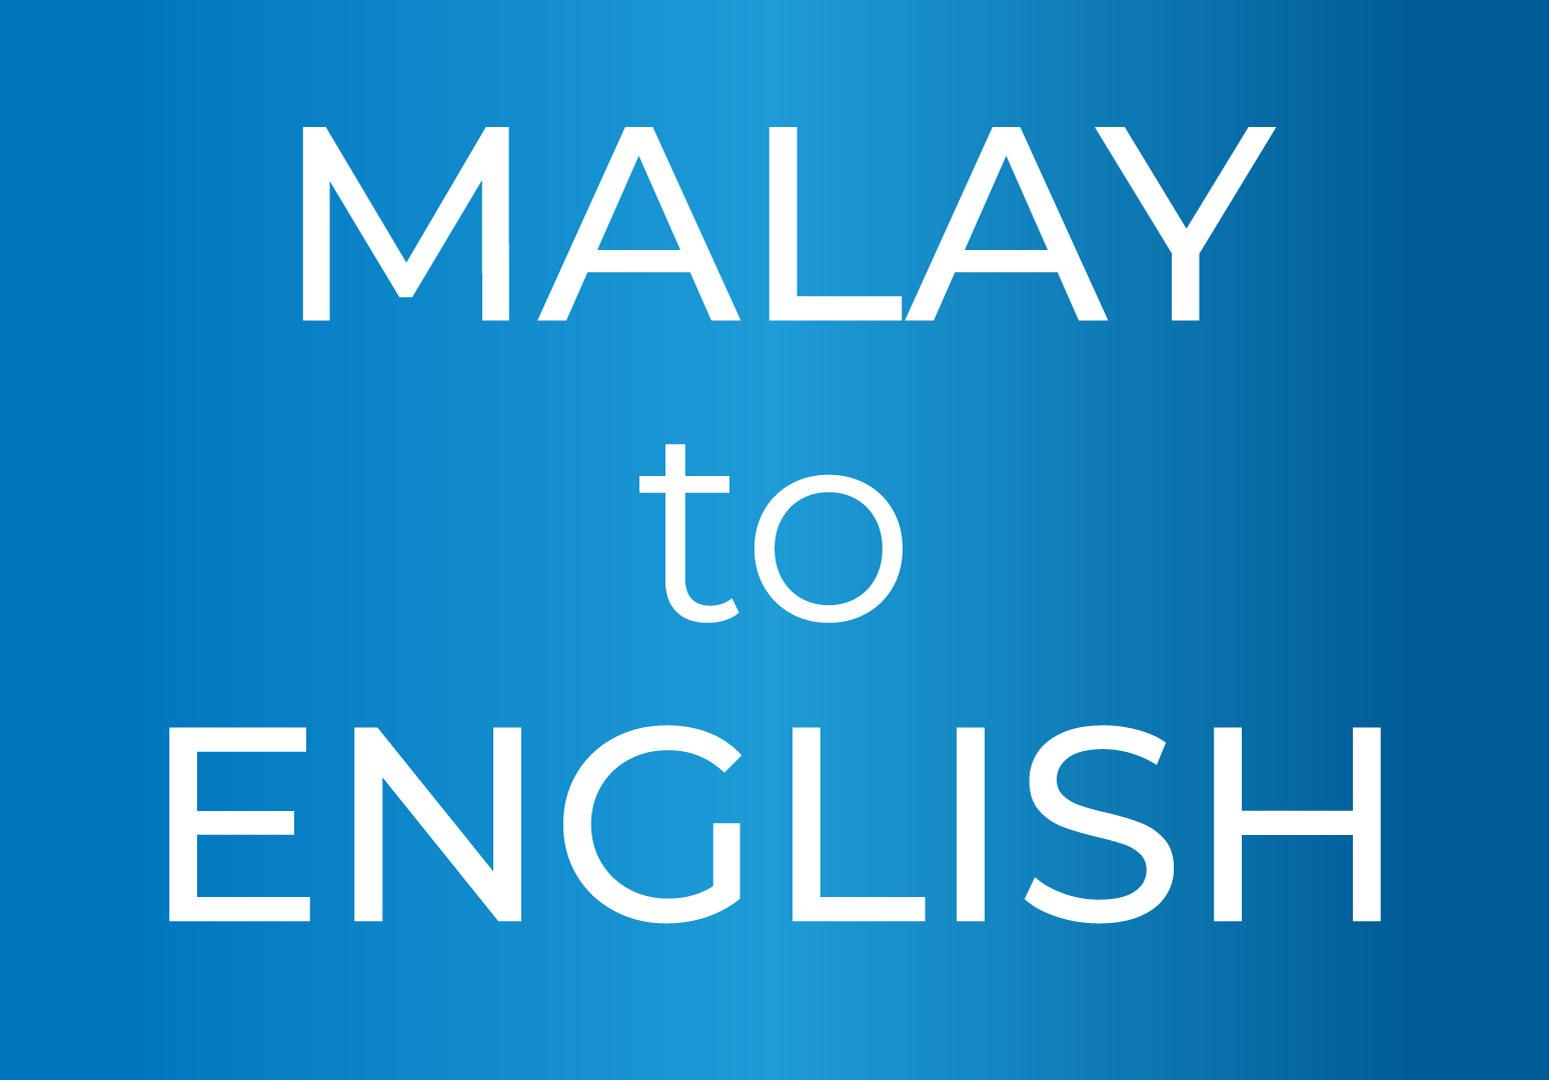 English to Malay translation anything